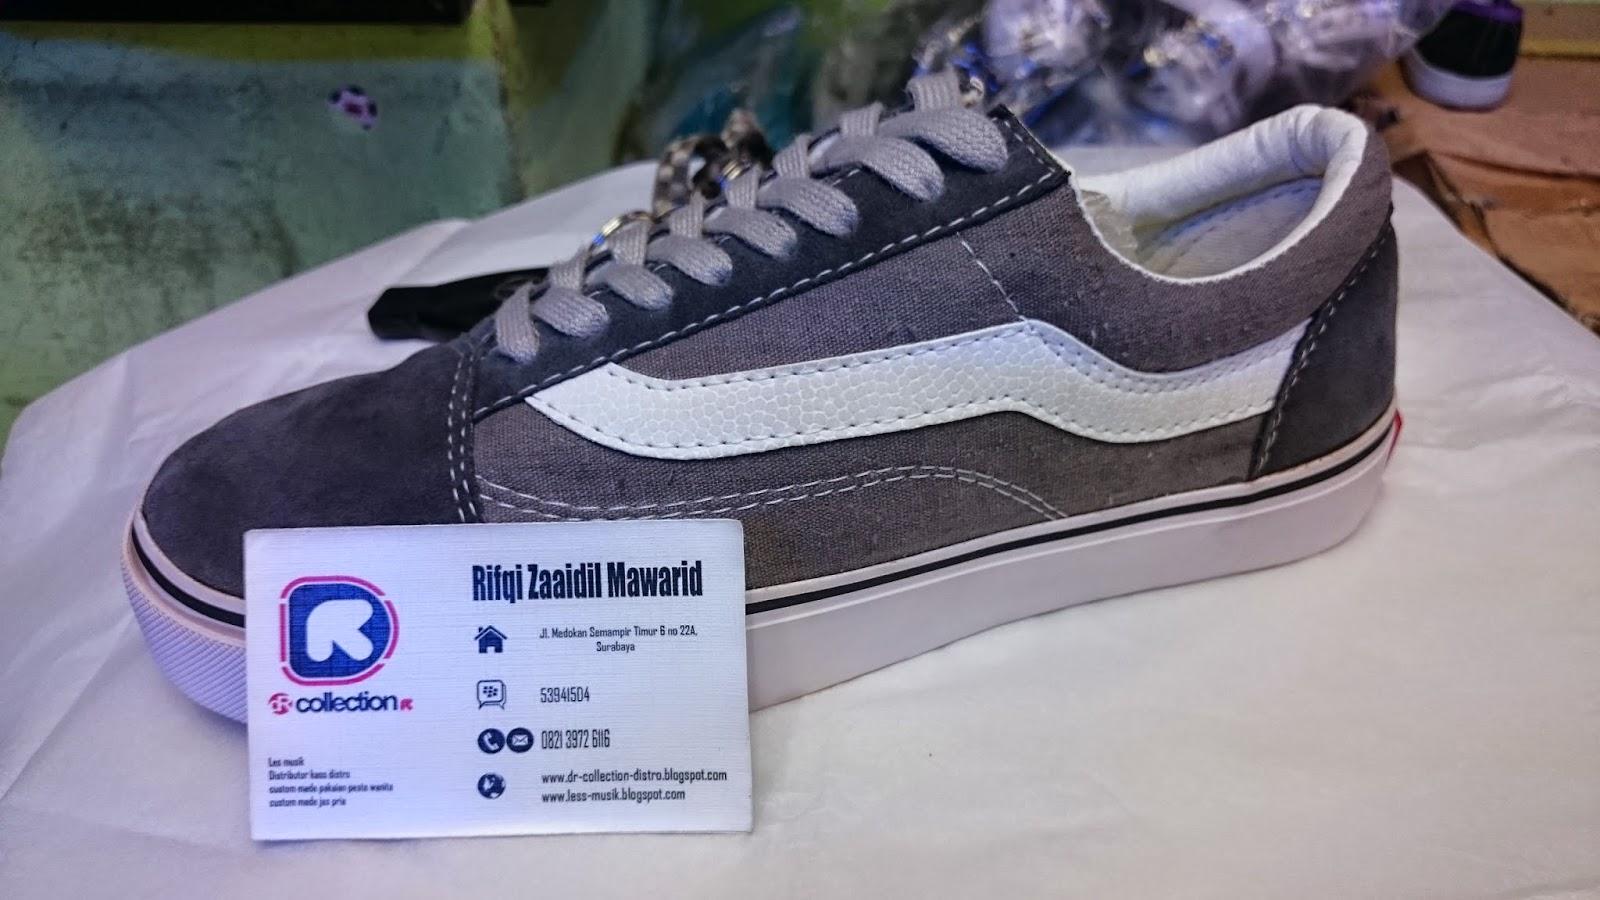 GROSIR KAOS DISTRO SURABAYA Jual Sepatu Vans Di Surabaya